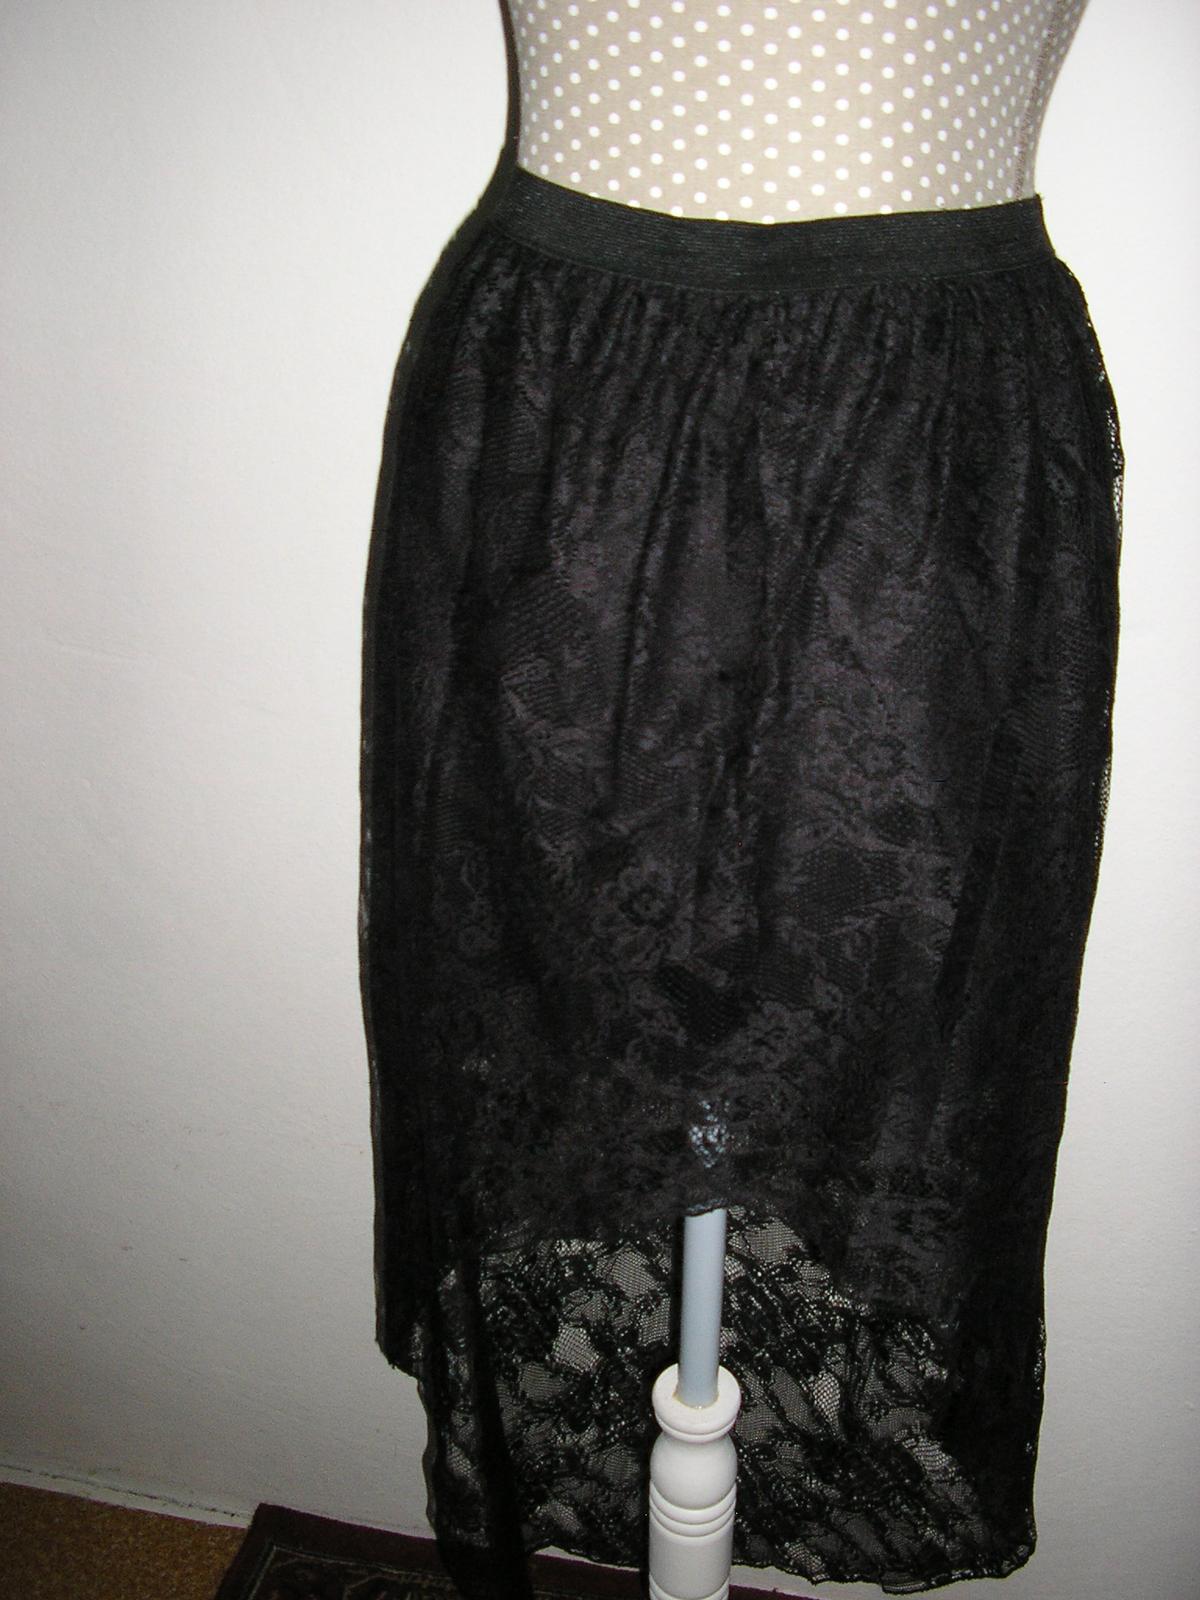 1072. Ginatrikot Čierna čipková sukňa  - Obrázok č. 1